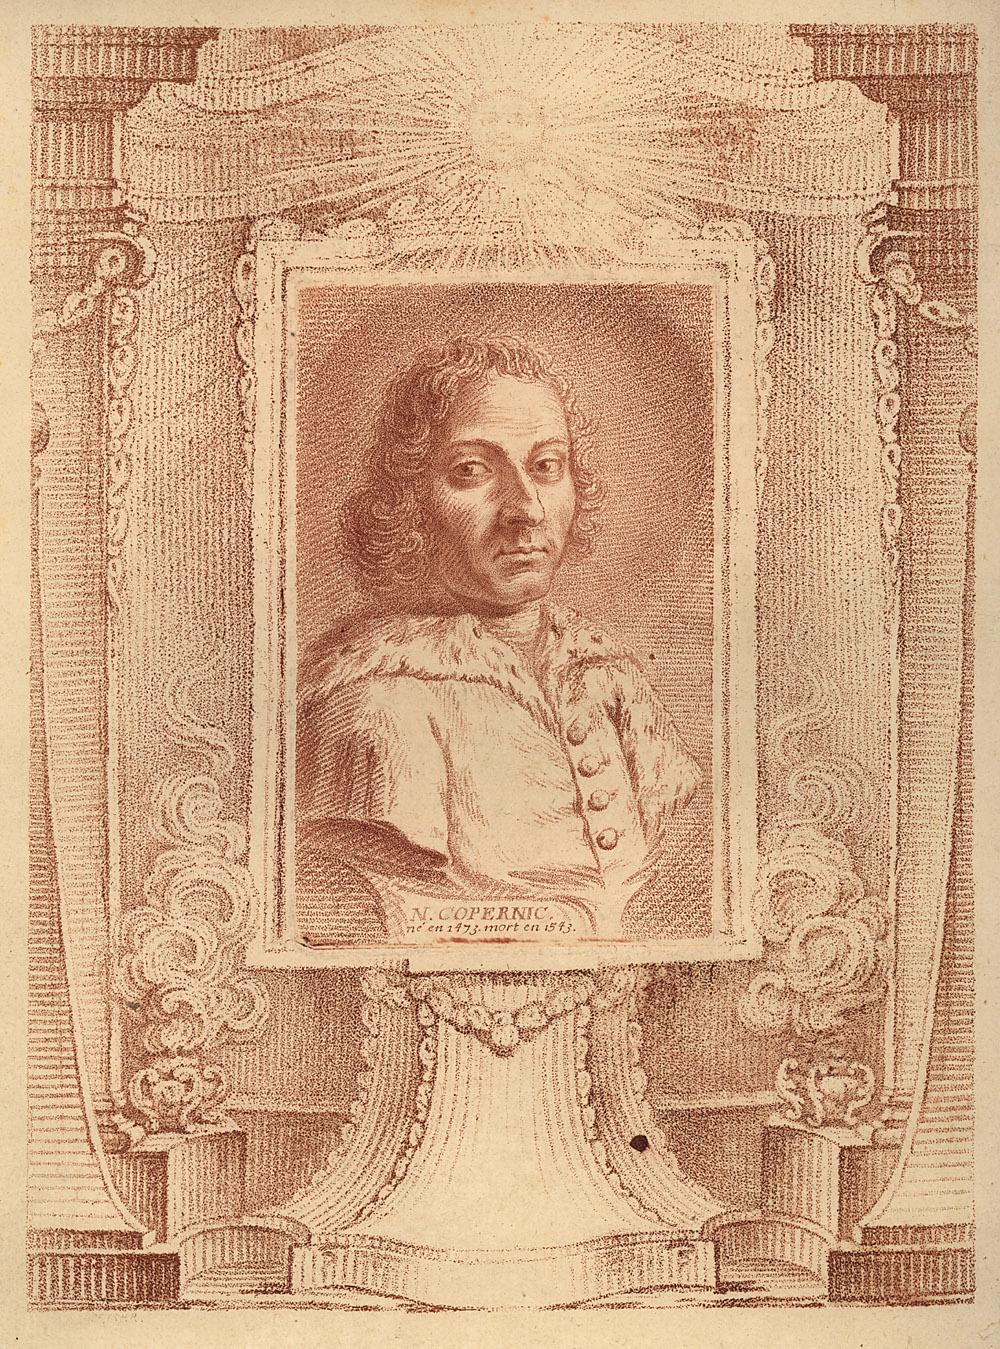 Portrait of Nicolaus Copernicus,  Image number:SIL14-C5-09a